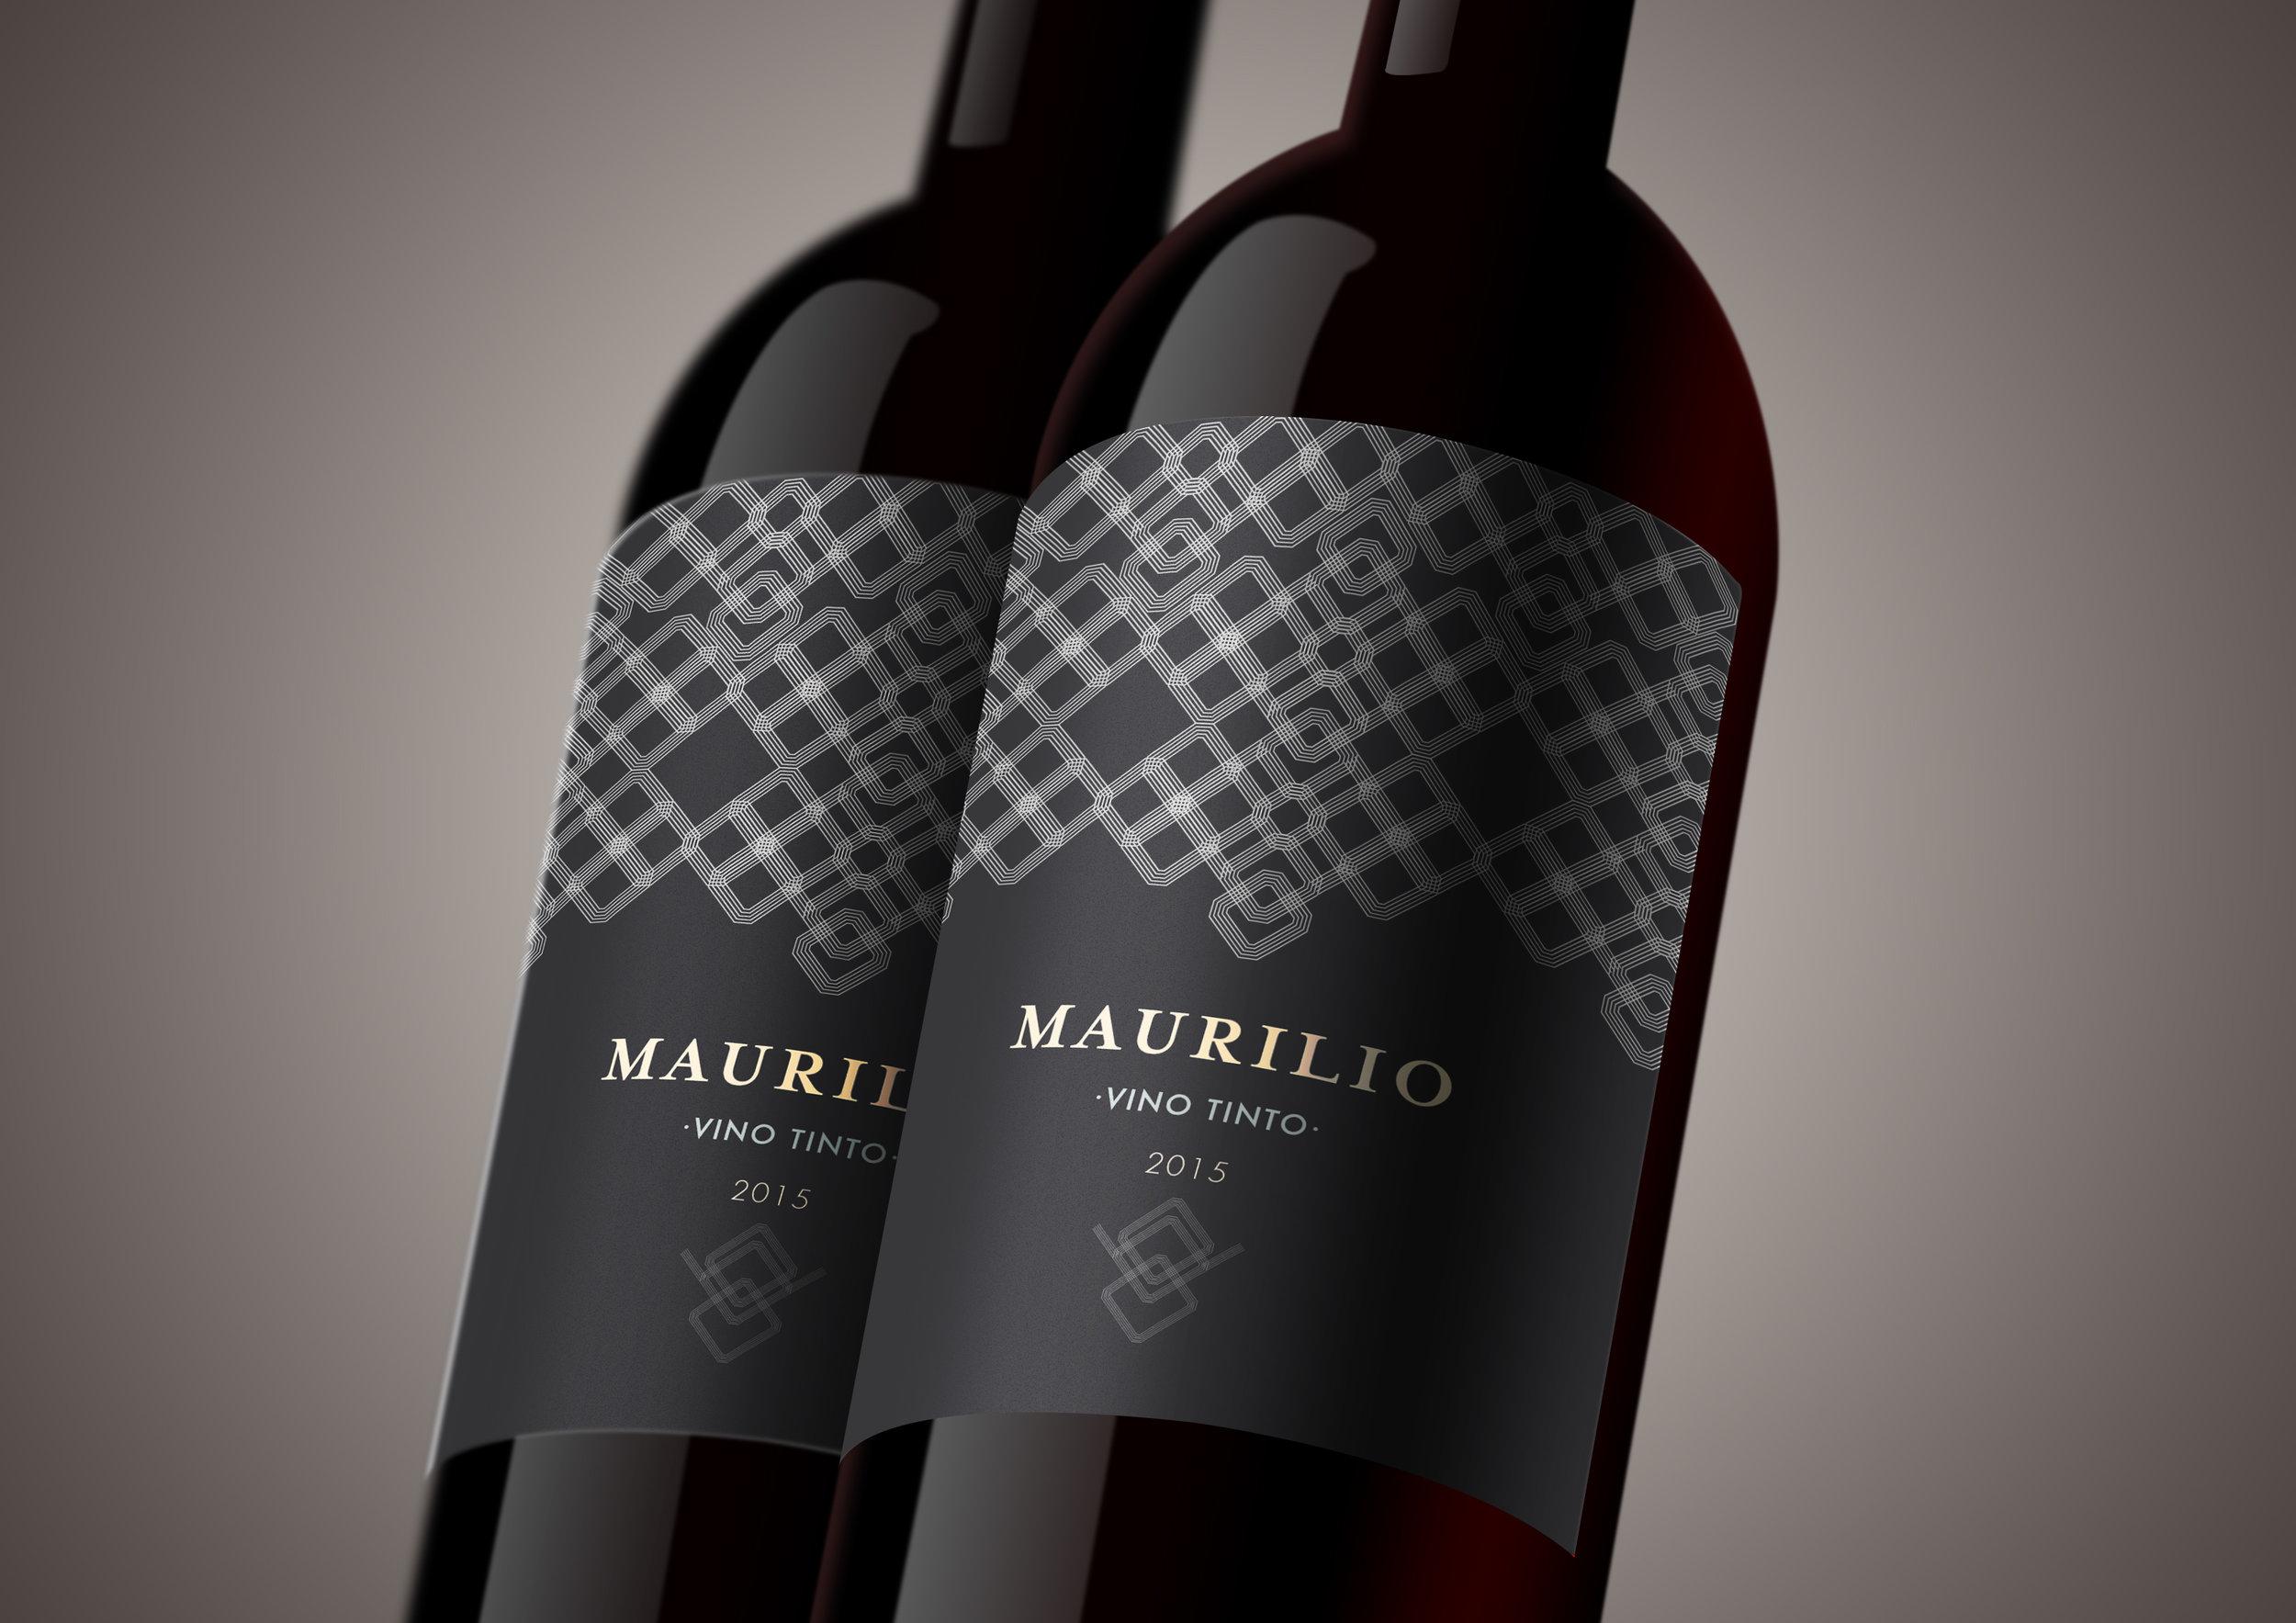 maurilio 2 bottle shot.jpg